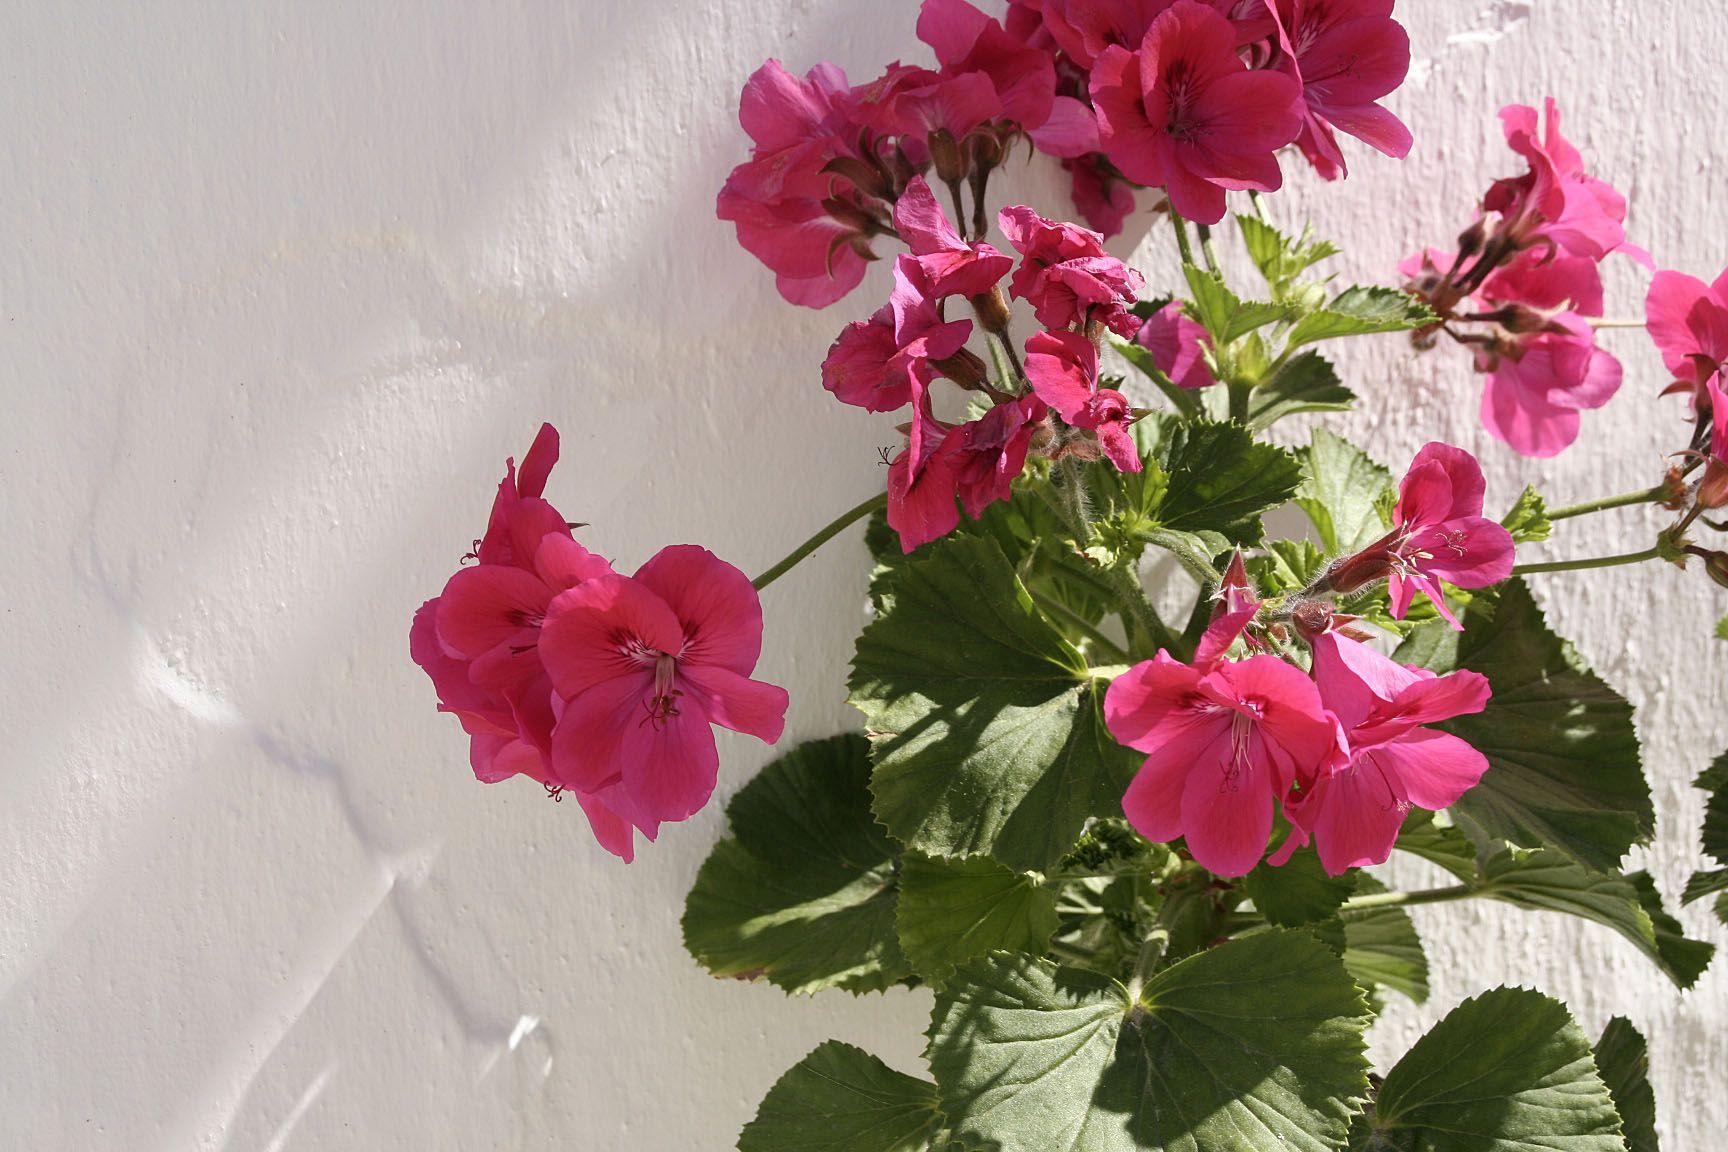 Flowers in Frigiliana, a lovely white village close to Malaga (50km).